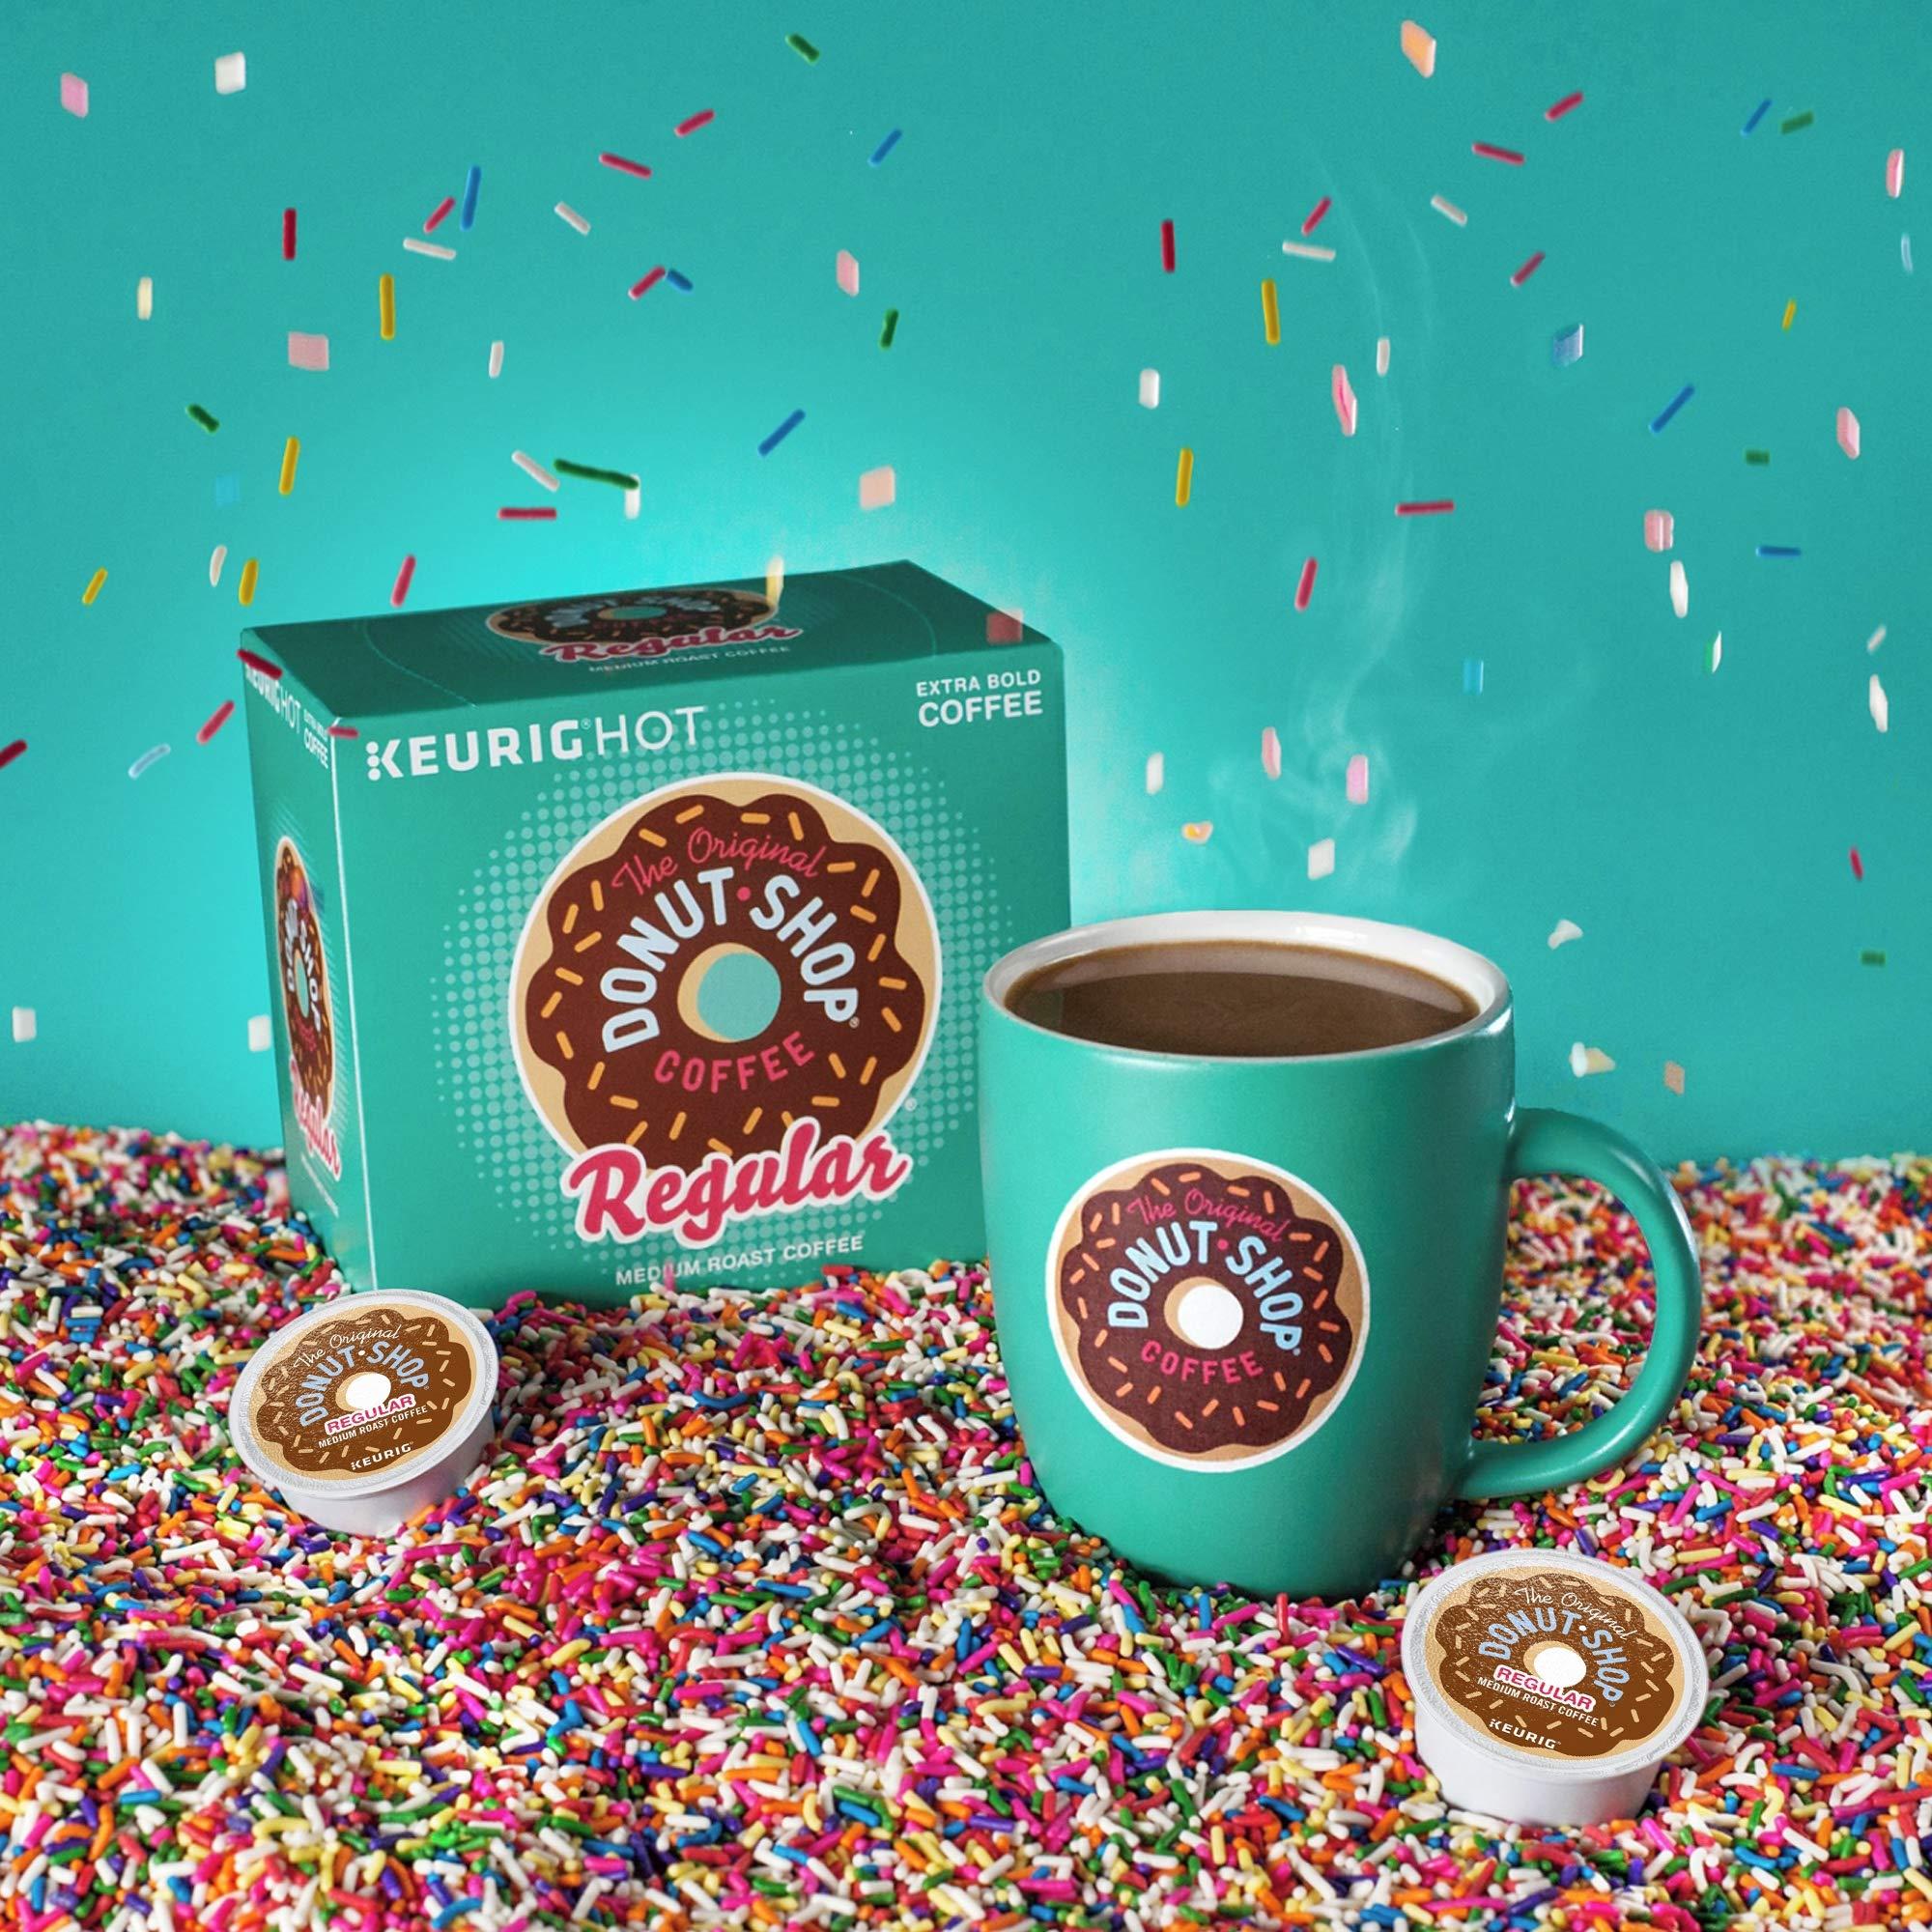 The Original Donut Shop Coffee, Regular Medium Roast, K-Cup Portion Count for Keurig Brewers 24-Count (Pack of 4) by The Original Donut Shop (Image #7)